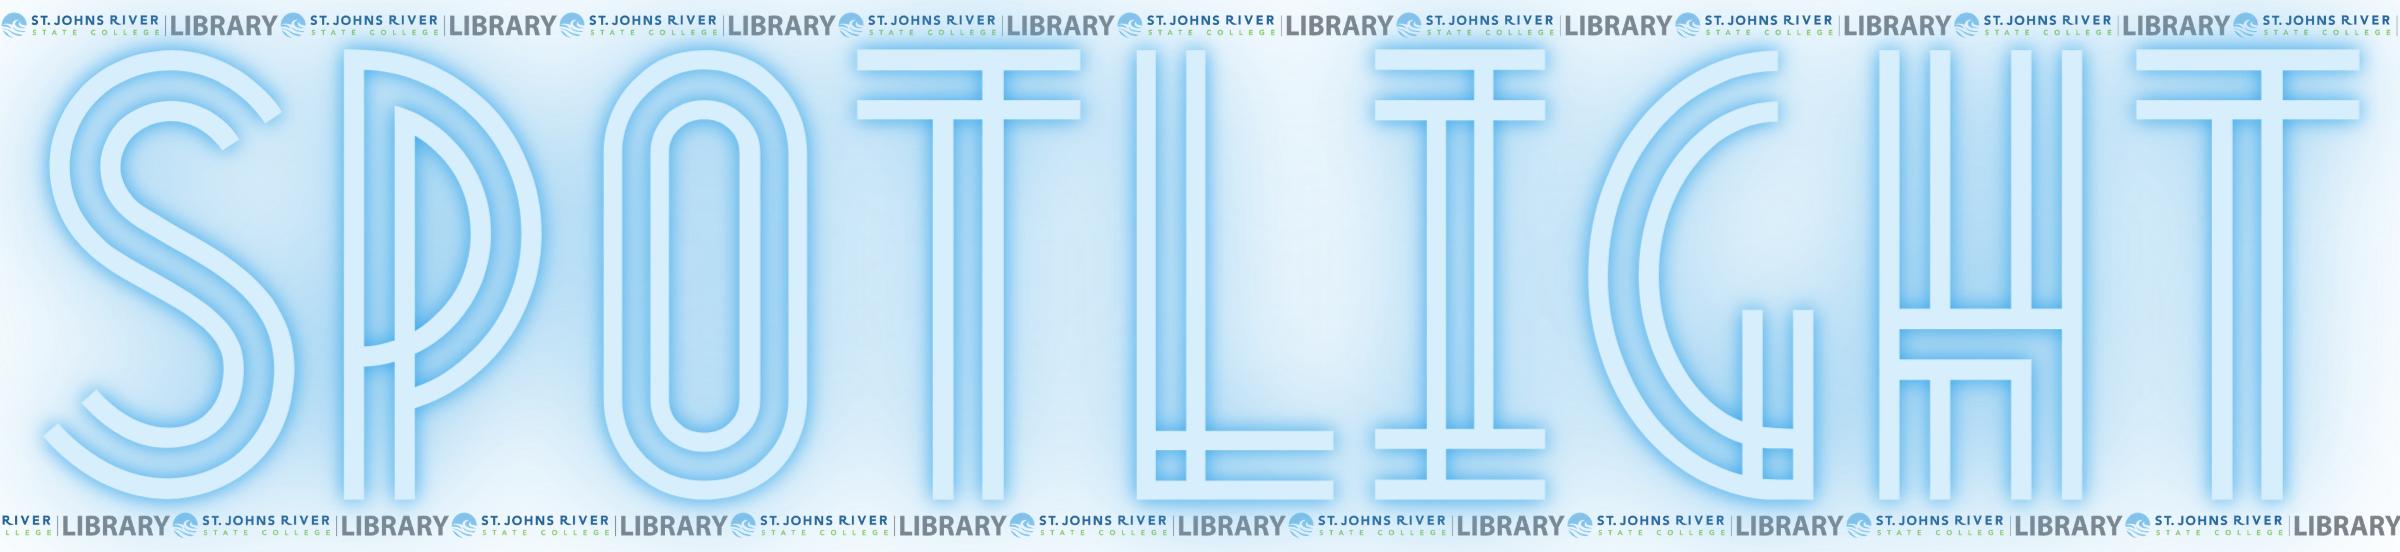 SJR State Library Spotlight